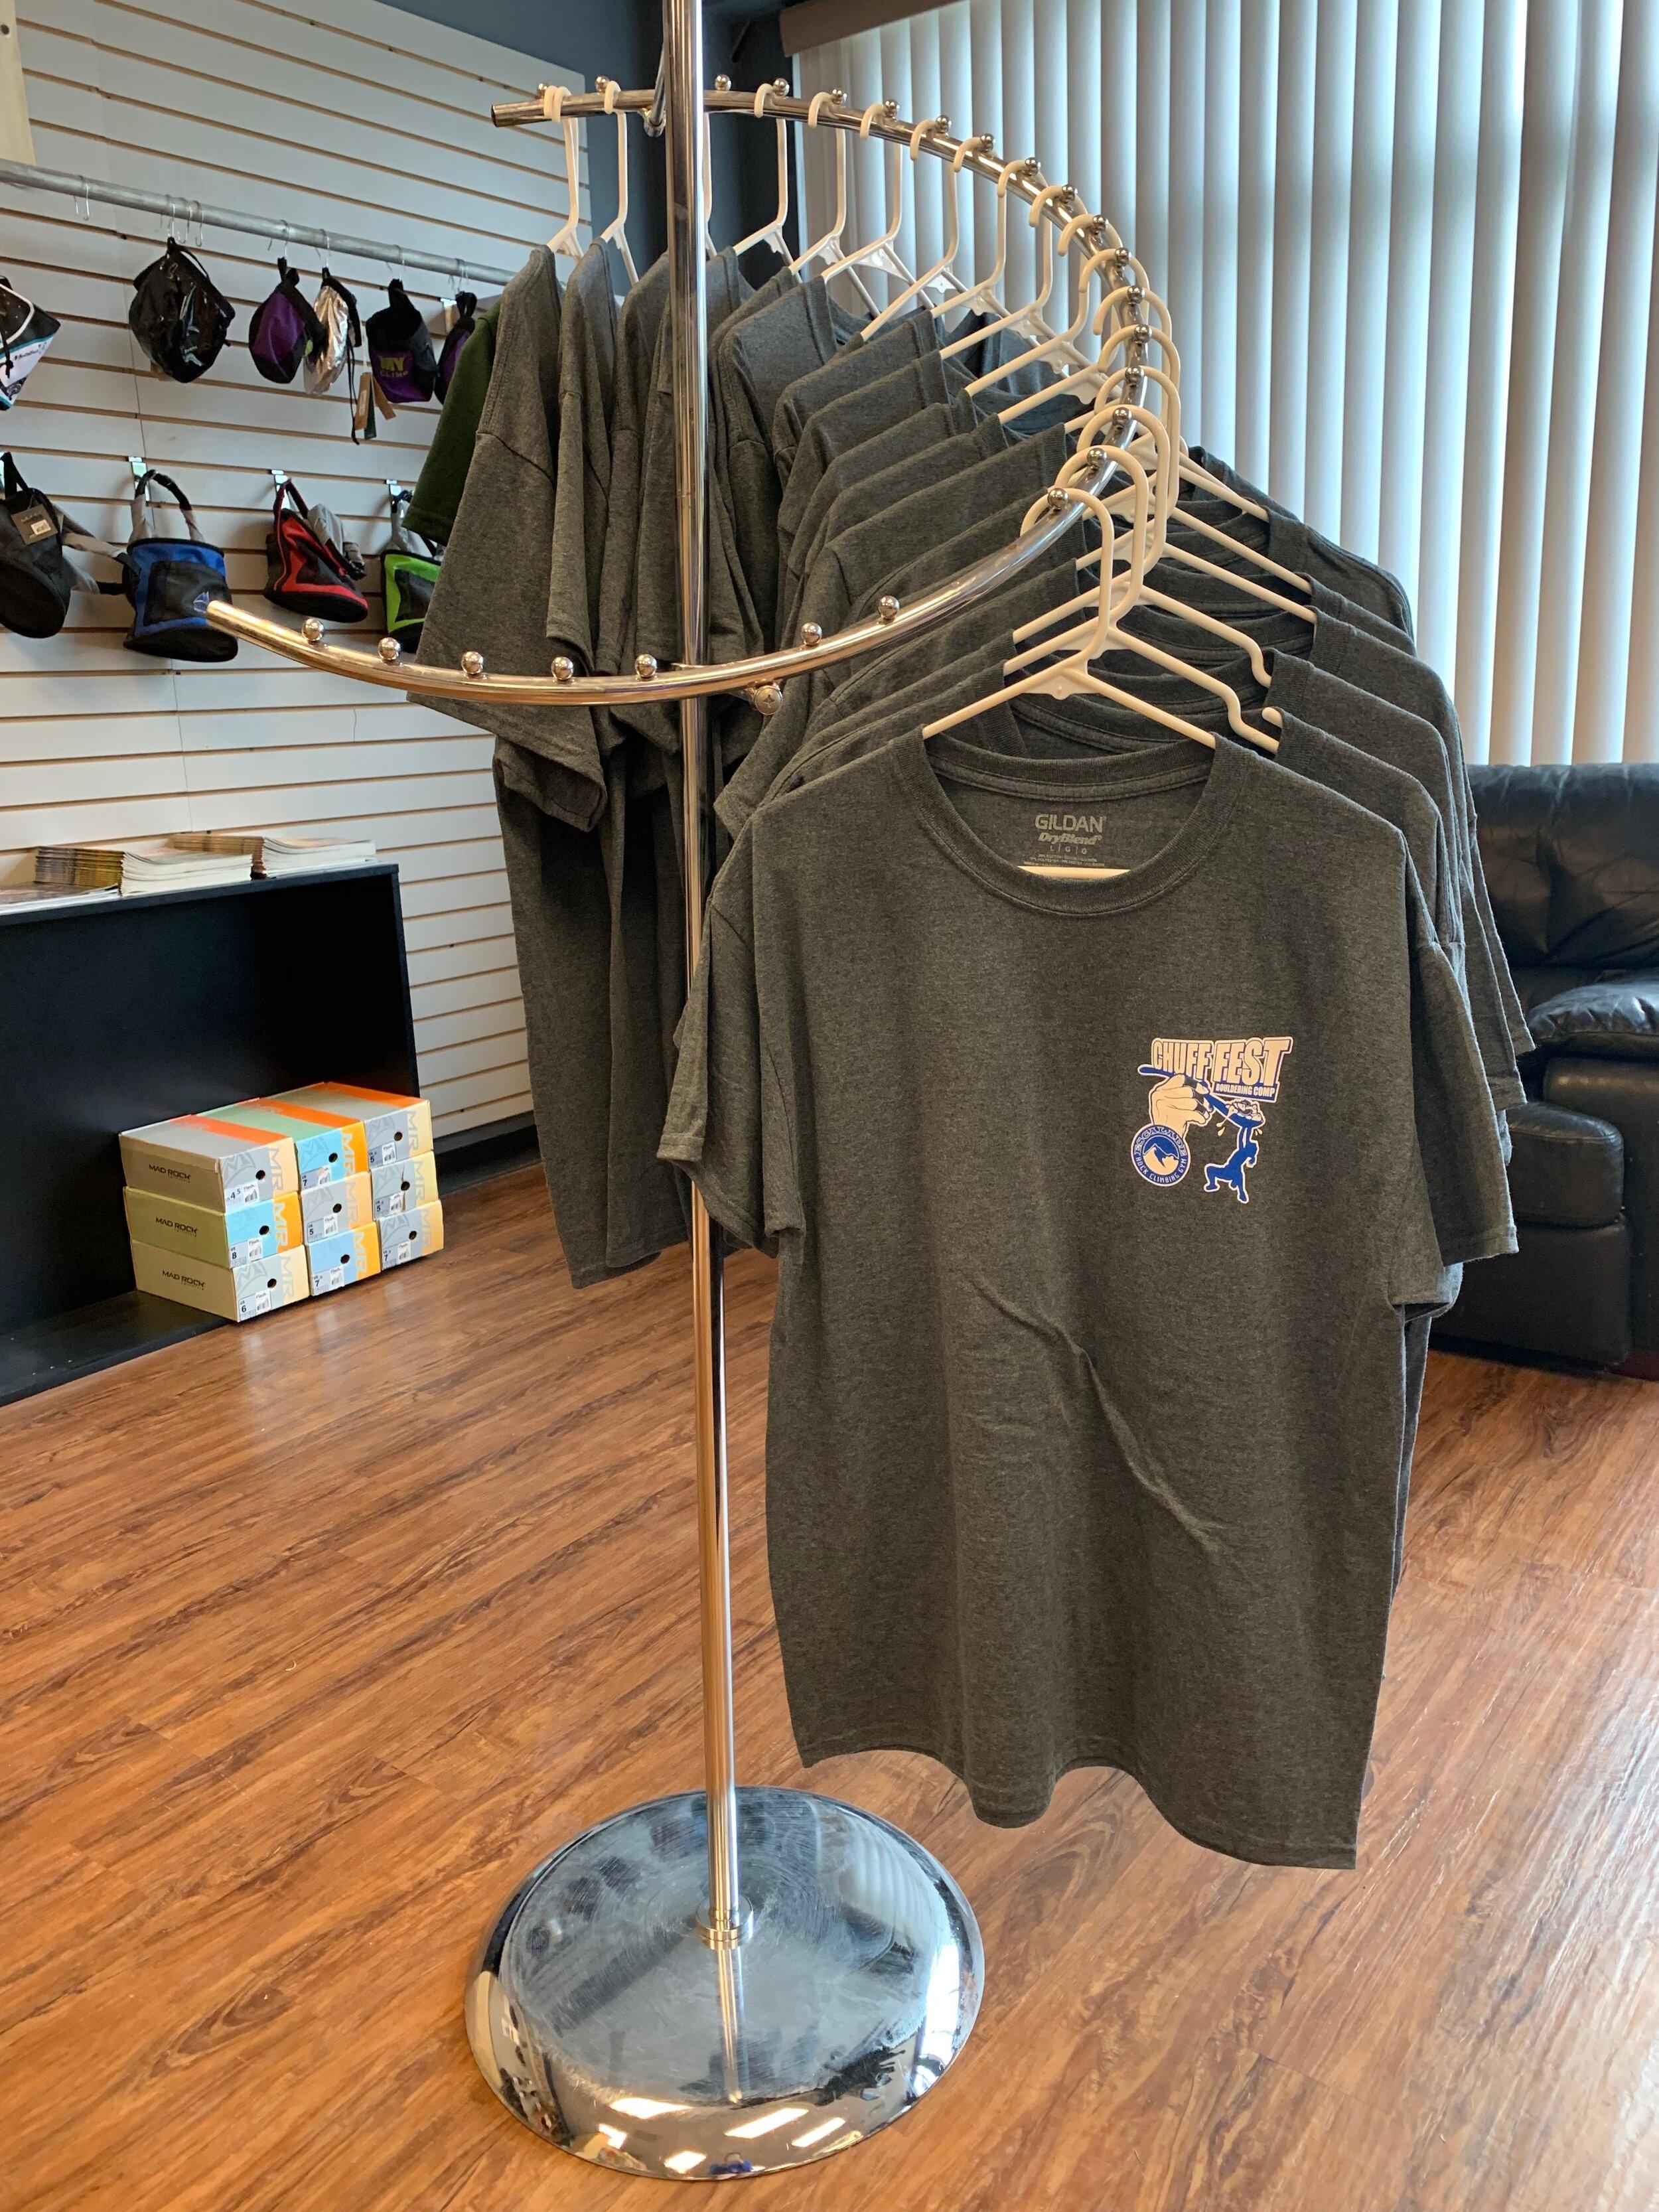 For Sale - Chuff Fest 2019 T-Shirts